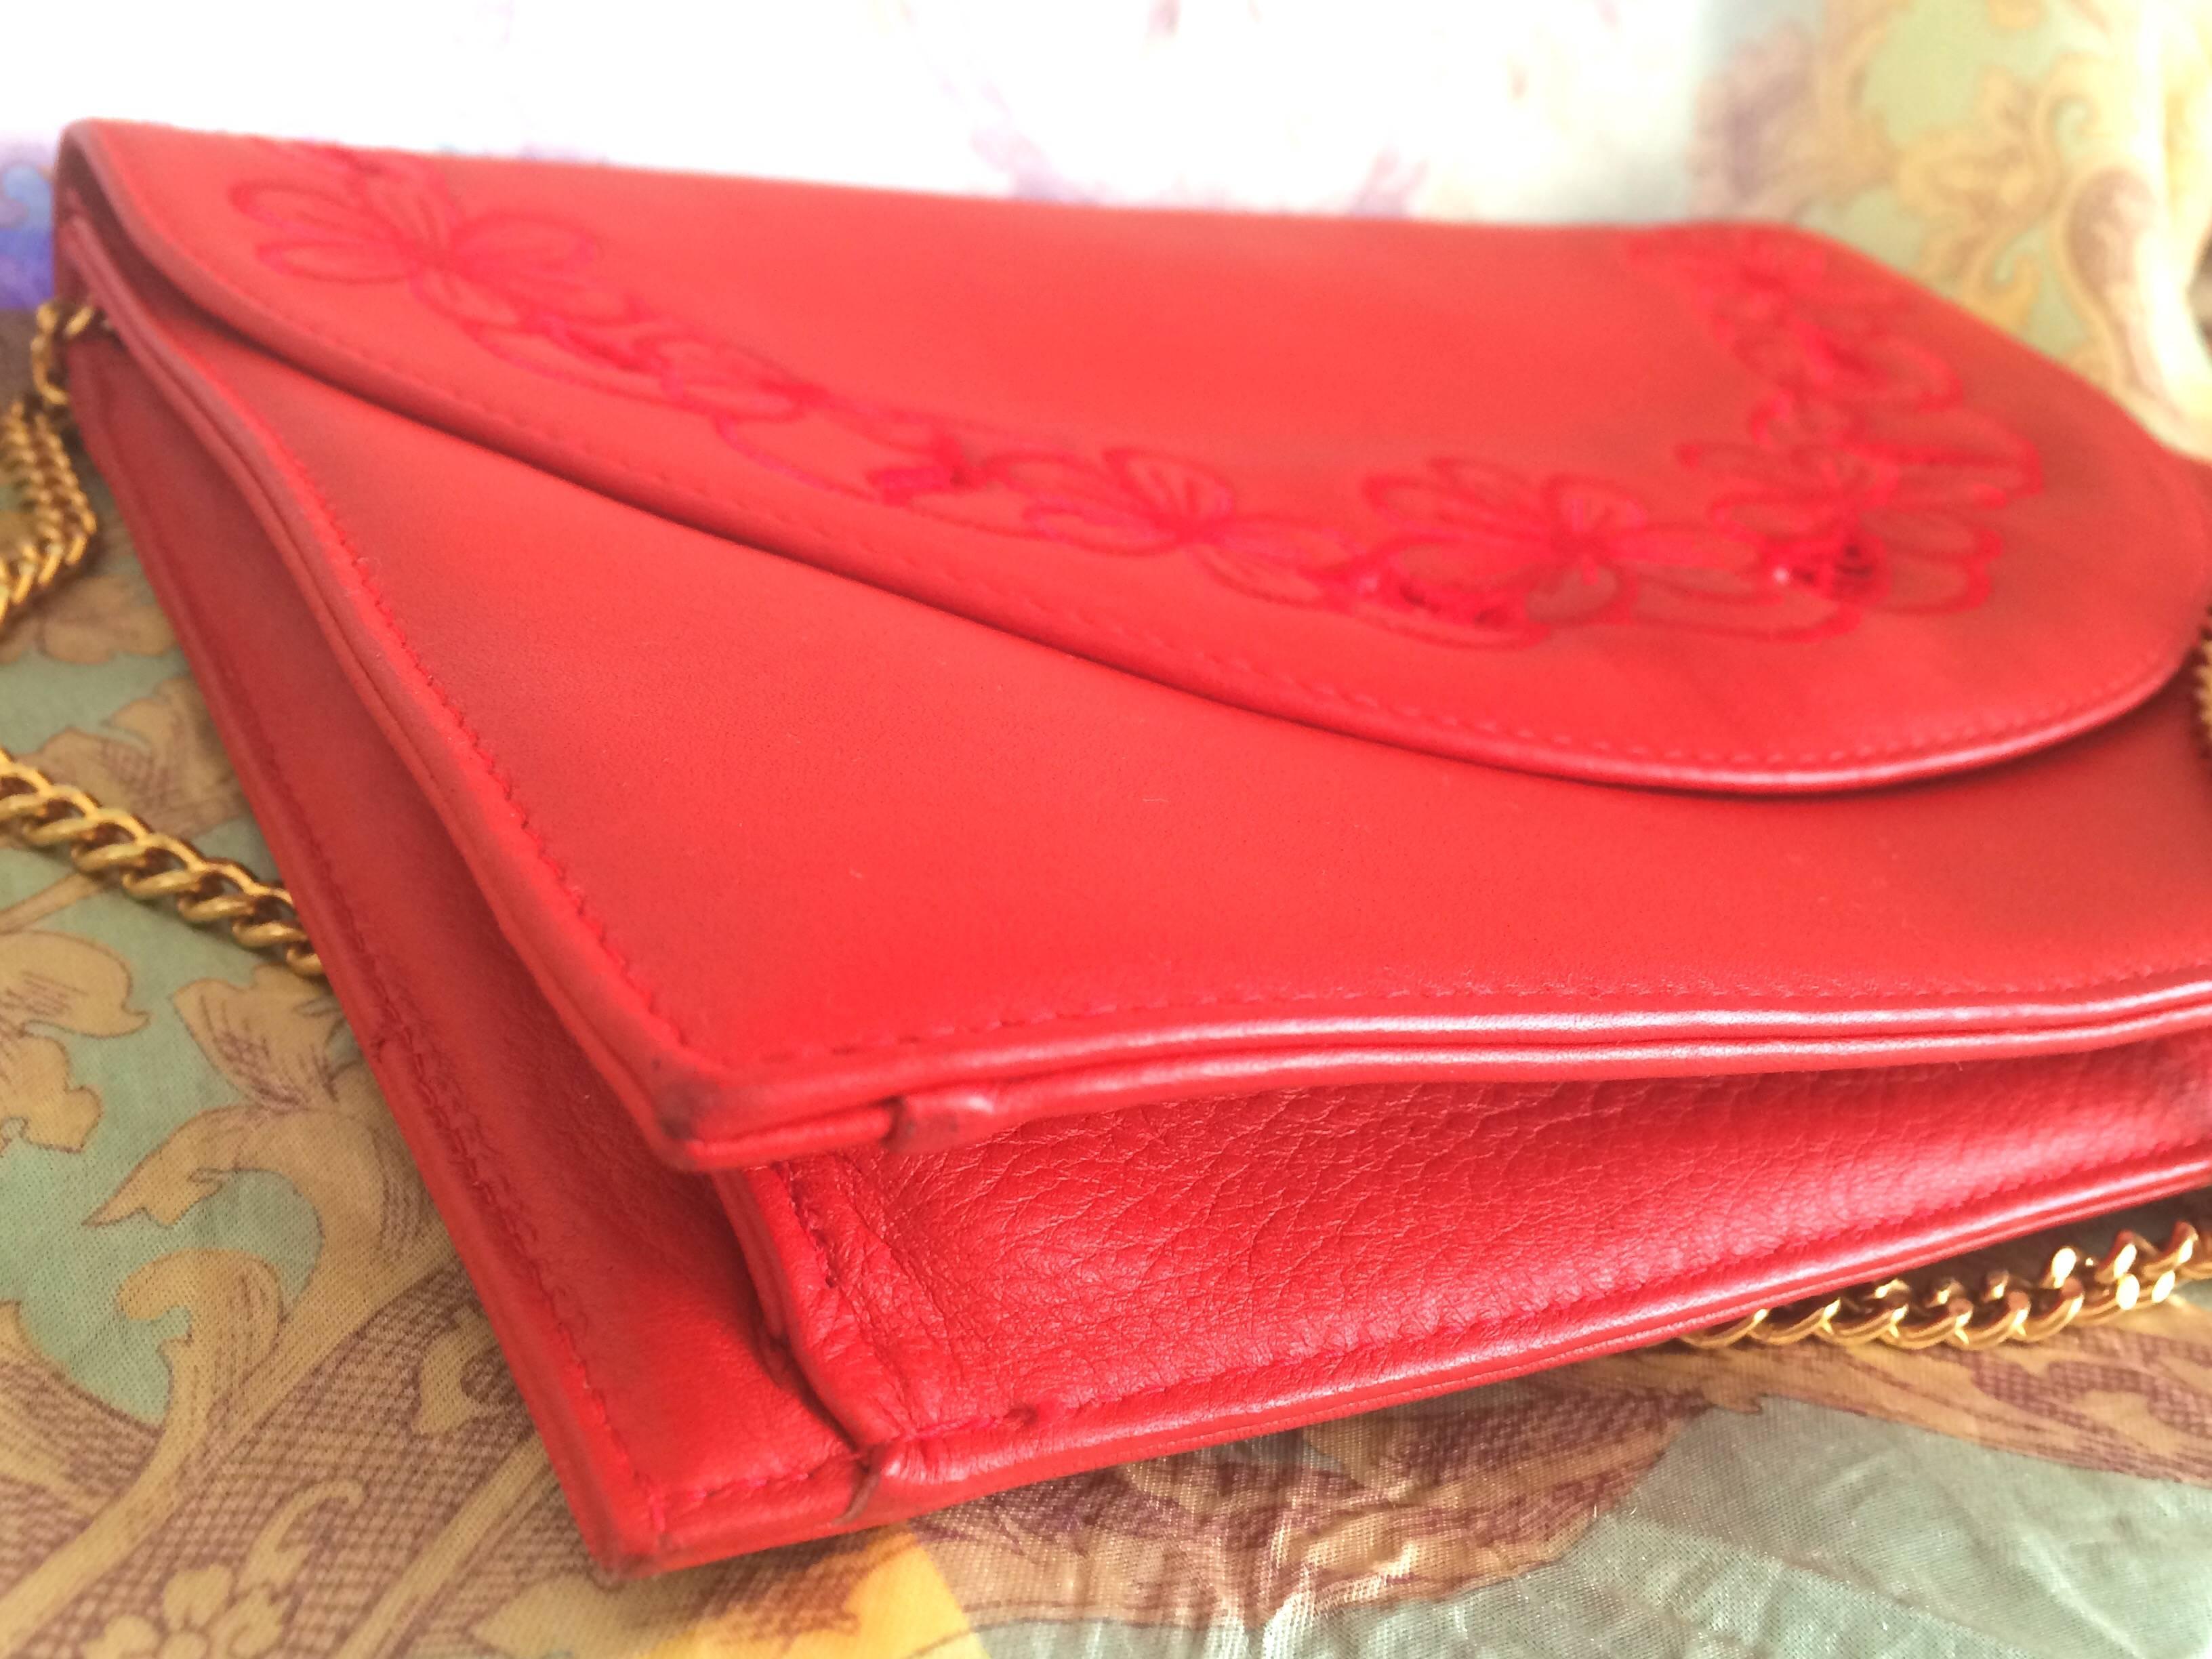 Valentino Vintage Valentino Garavani Red Clutch Shoulder Bag With Flower Embroidery Deco vgthBW